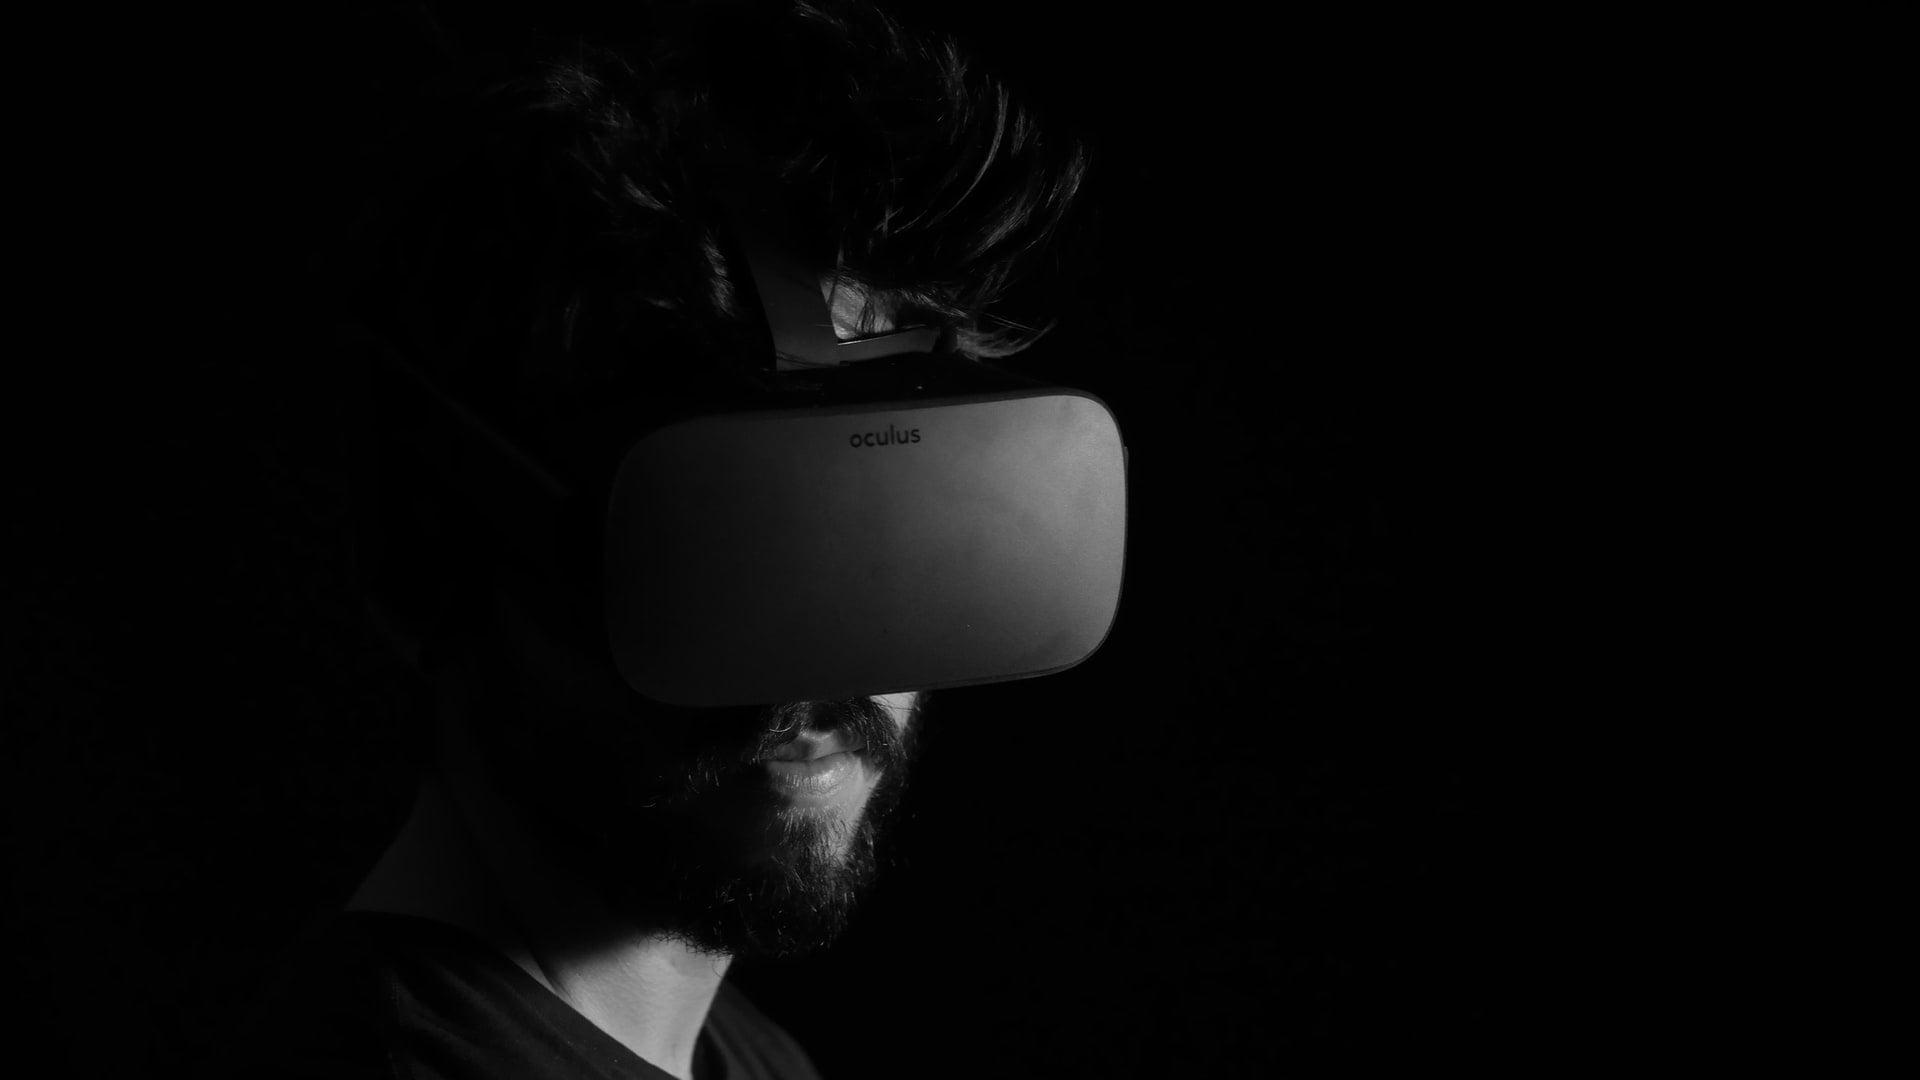 VR віртуальна реальність Lux Interaction Unsplash